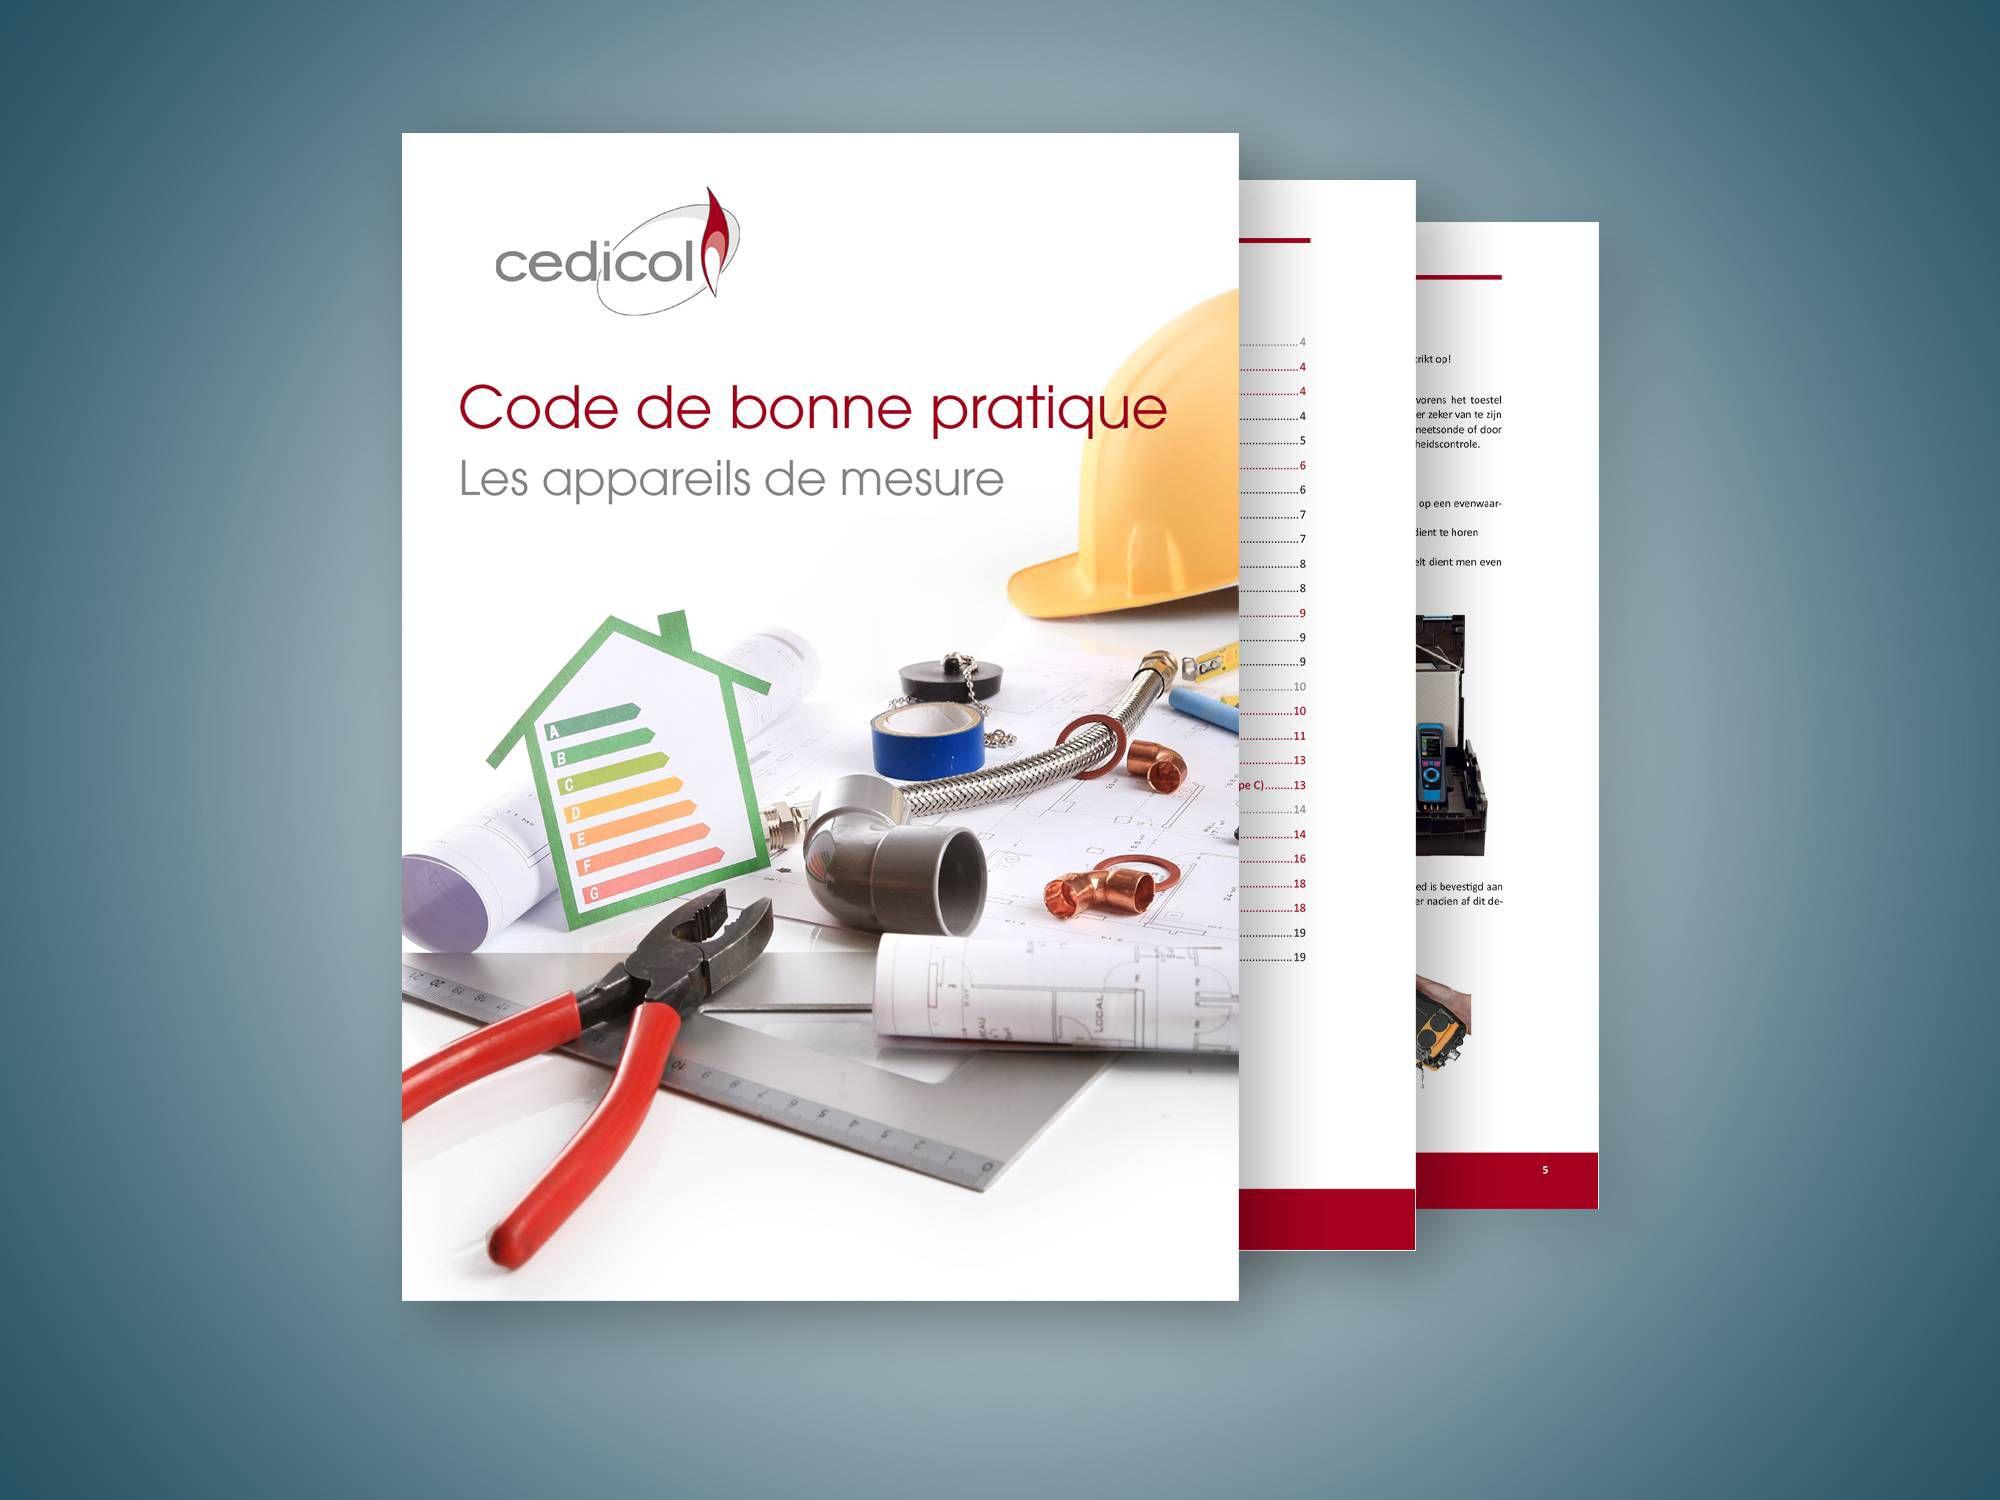 CODE_DE_BONN_PRATIQUE_APPAREILS_DE_MESURE_FR.jpg